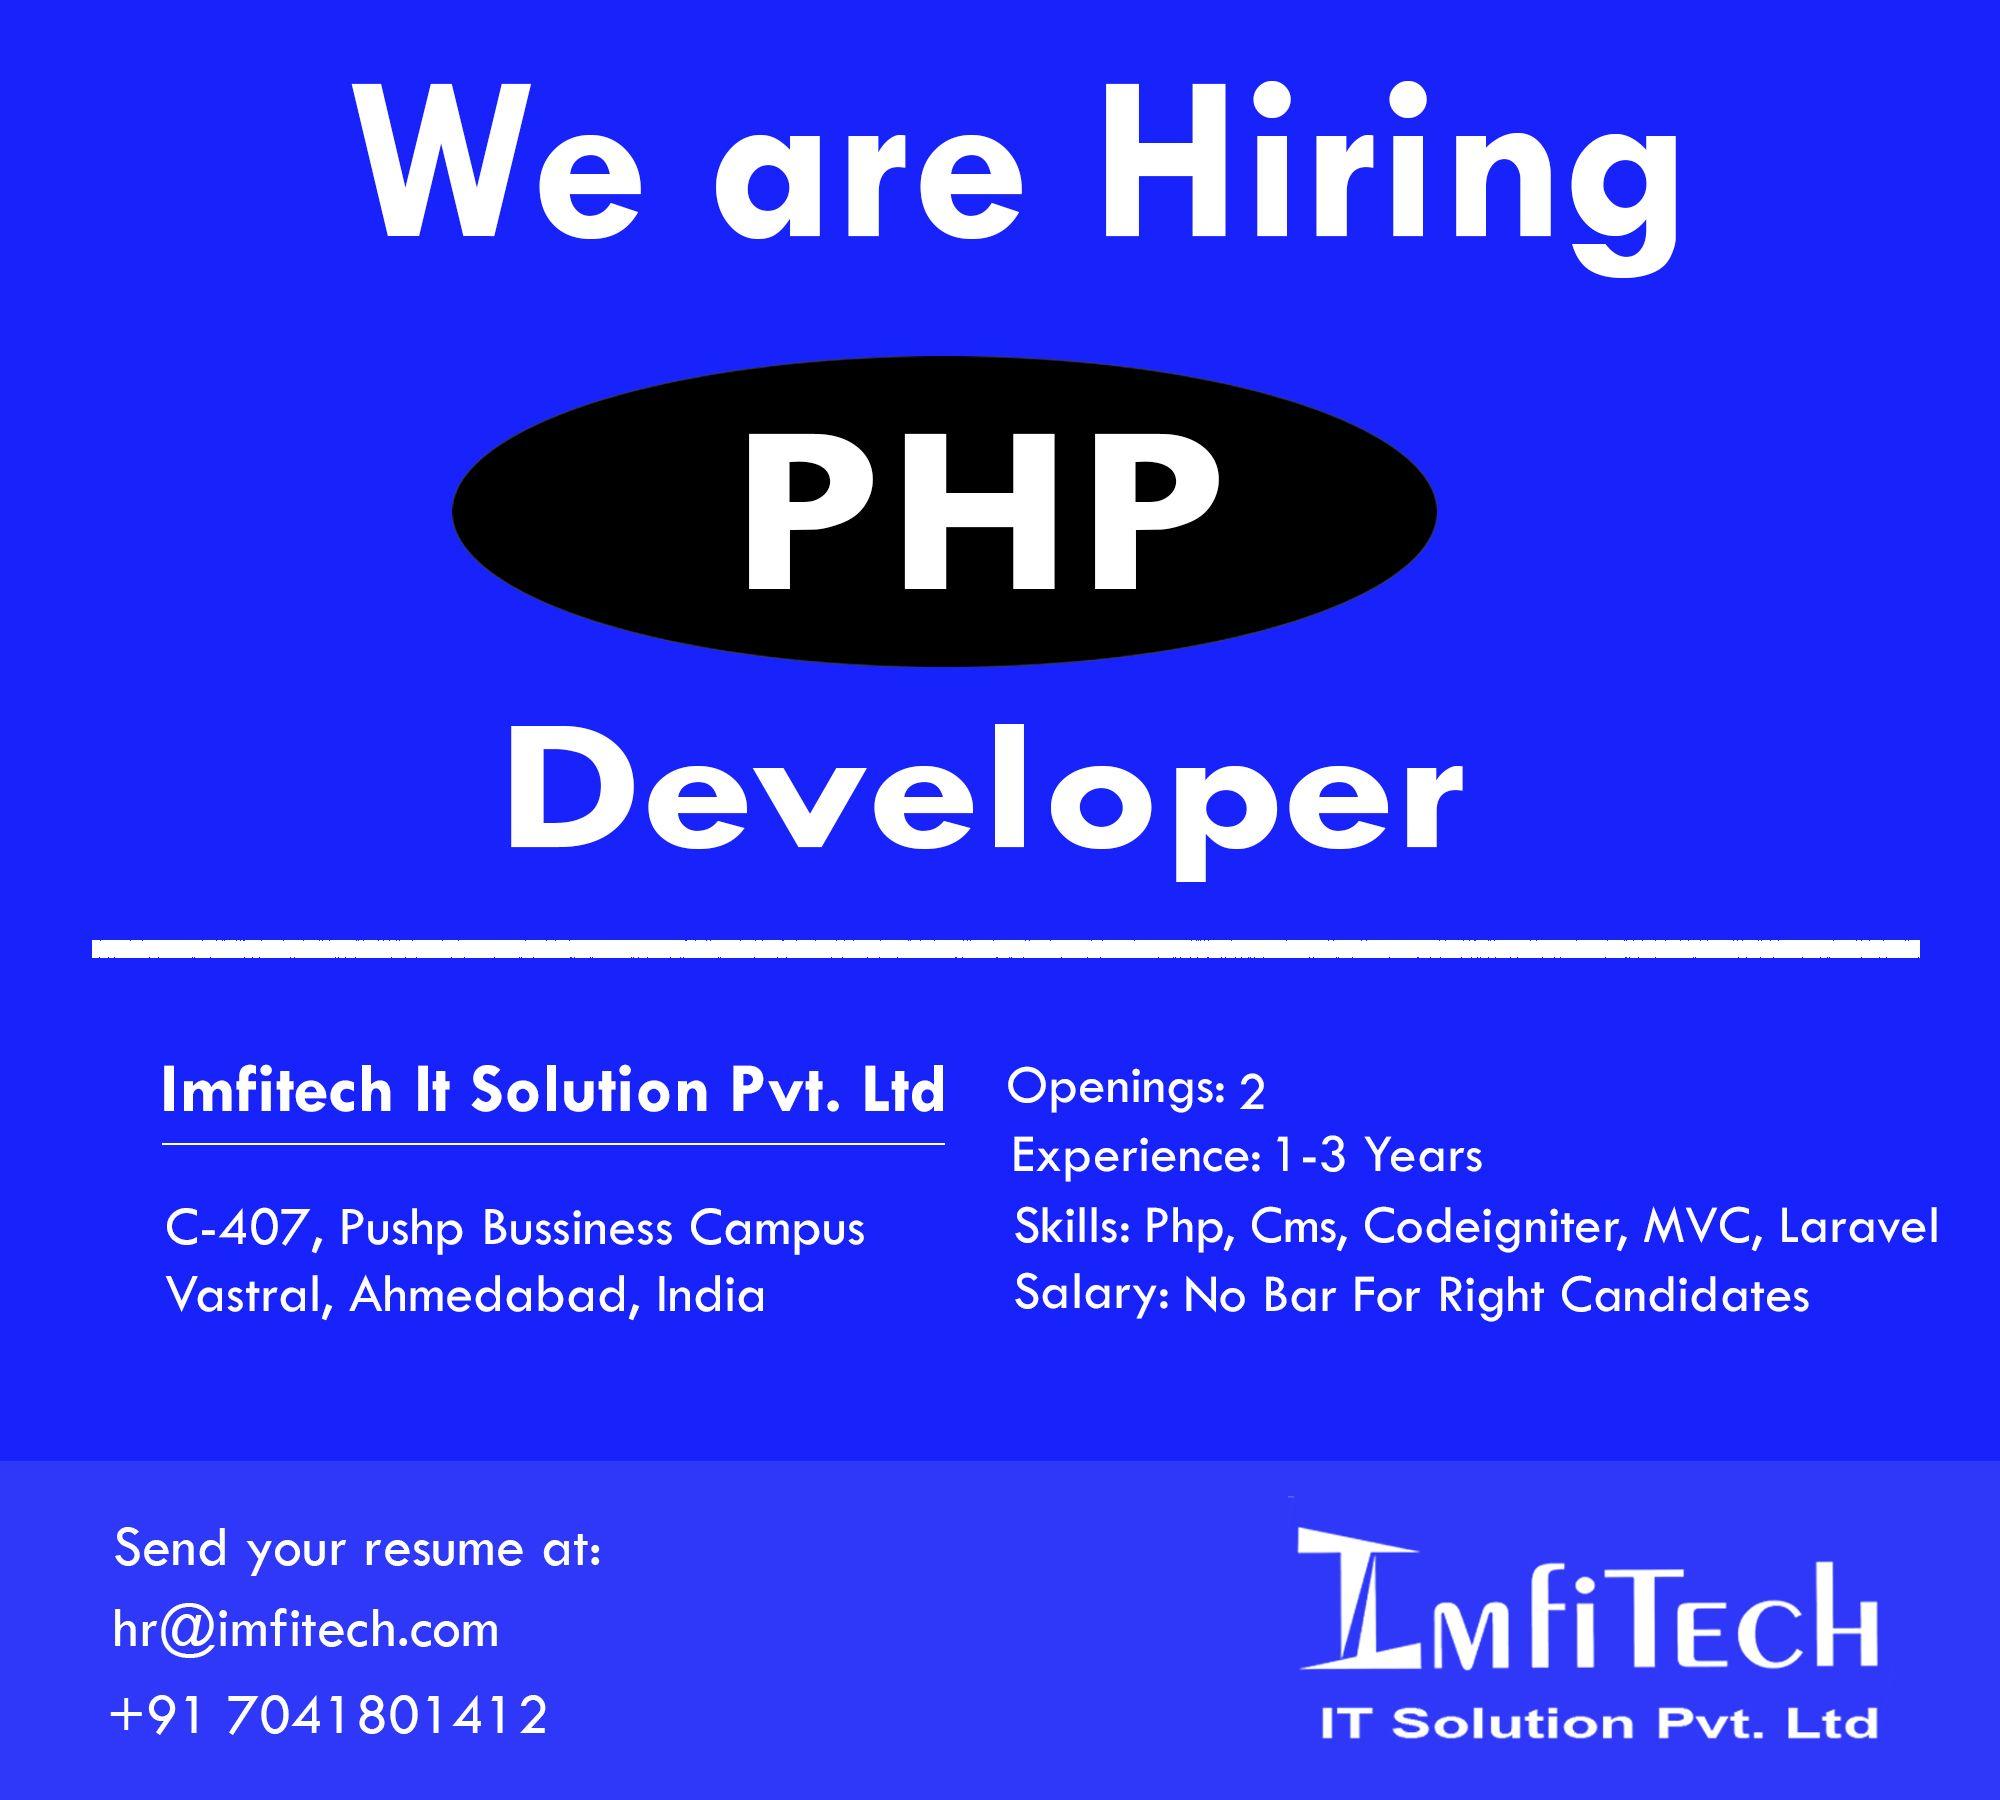 Hire PHP Developer Urgent Basis Imfitech IT Solution Pvt